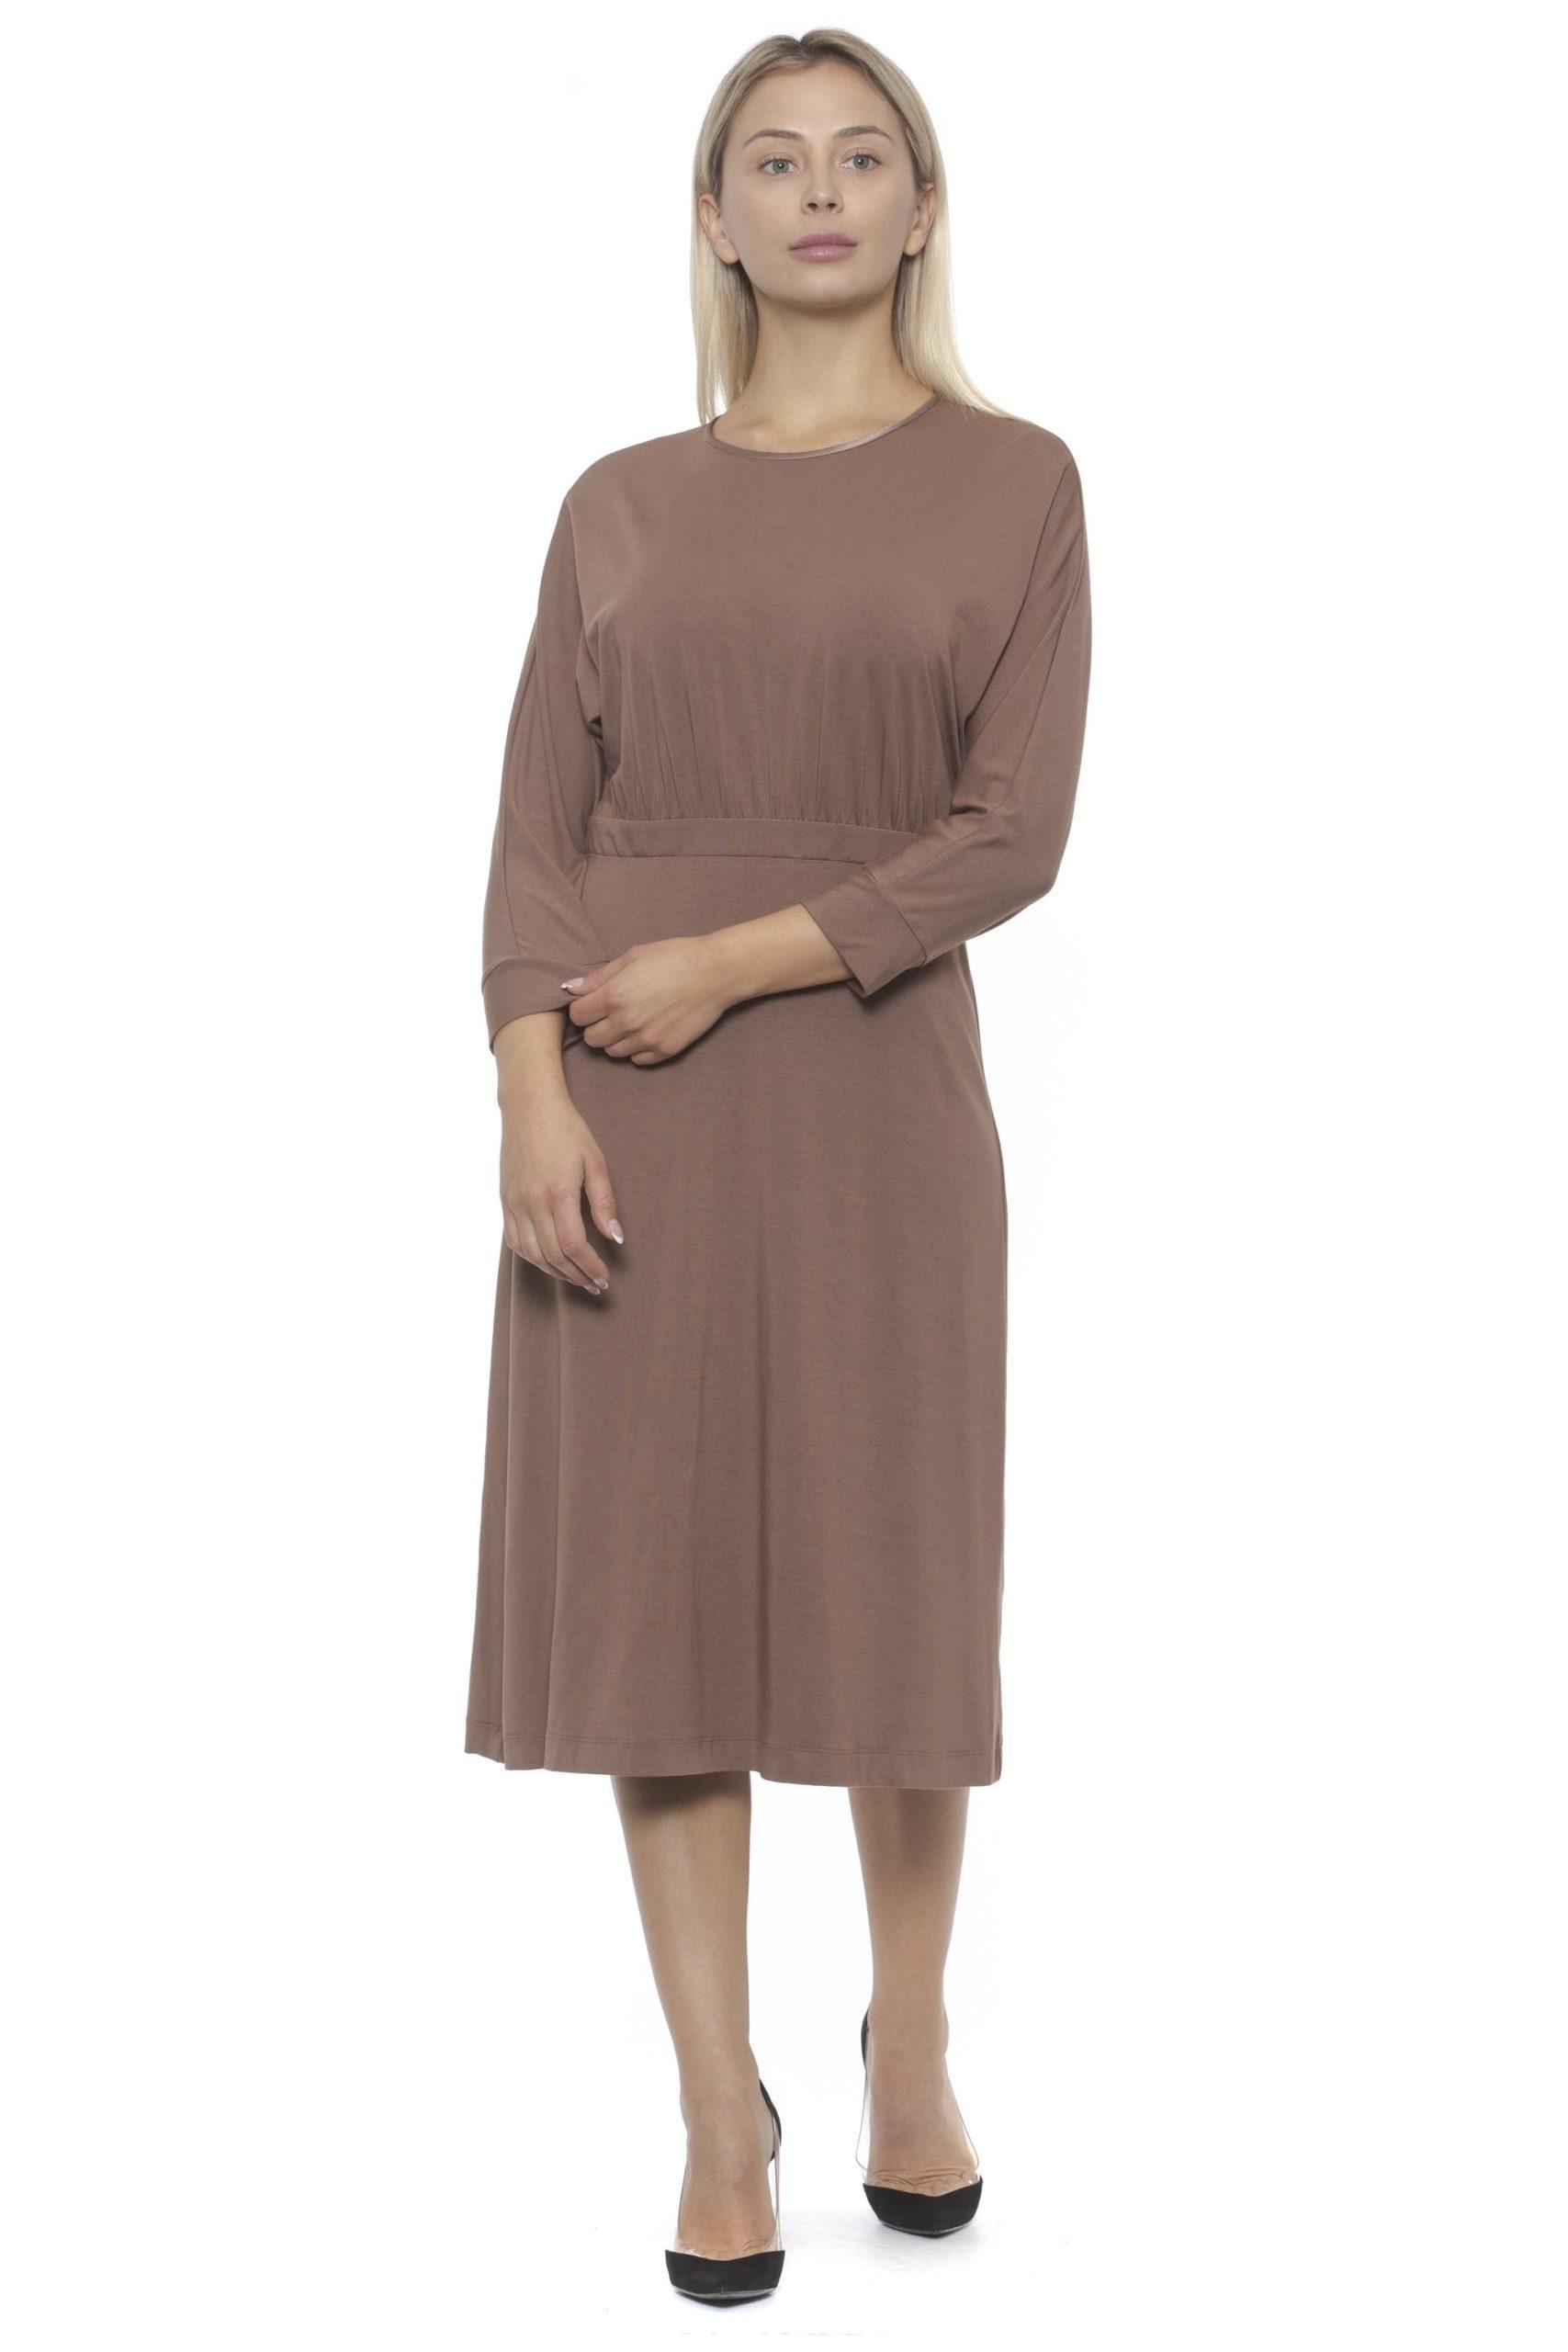 Peserico Women's Brosa Dress Pink PE1383180 - IT42 | S